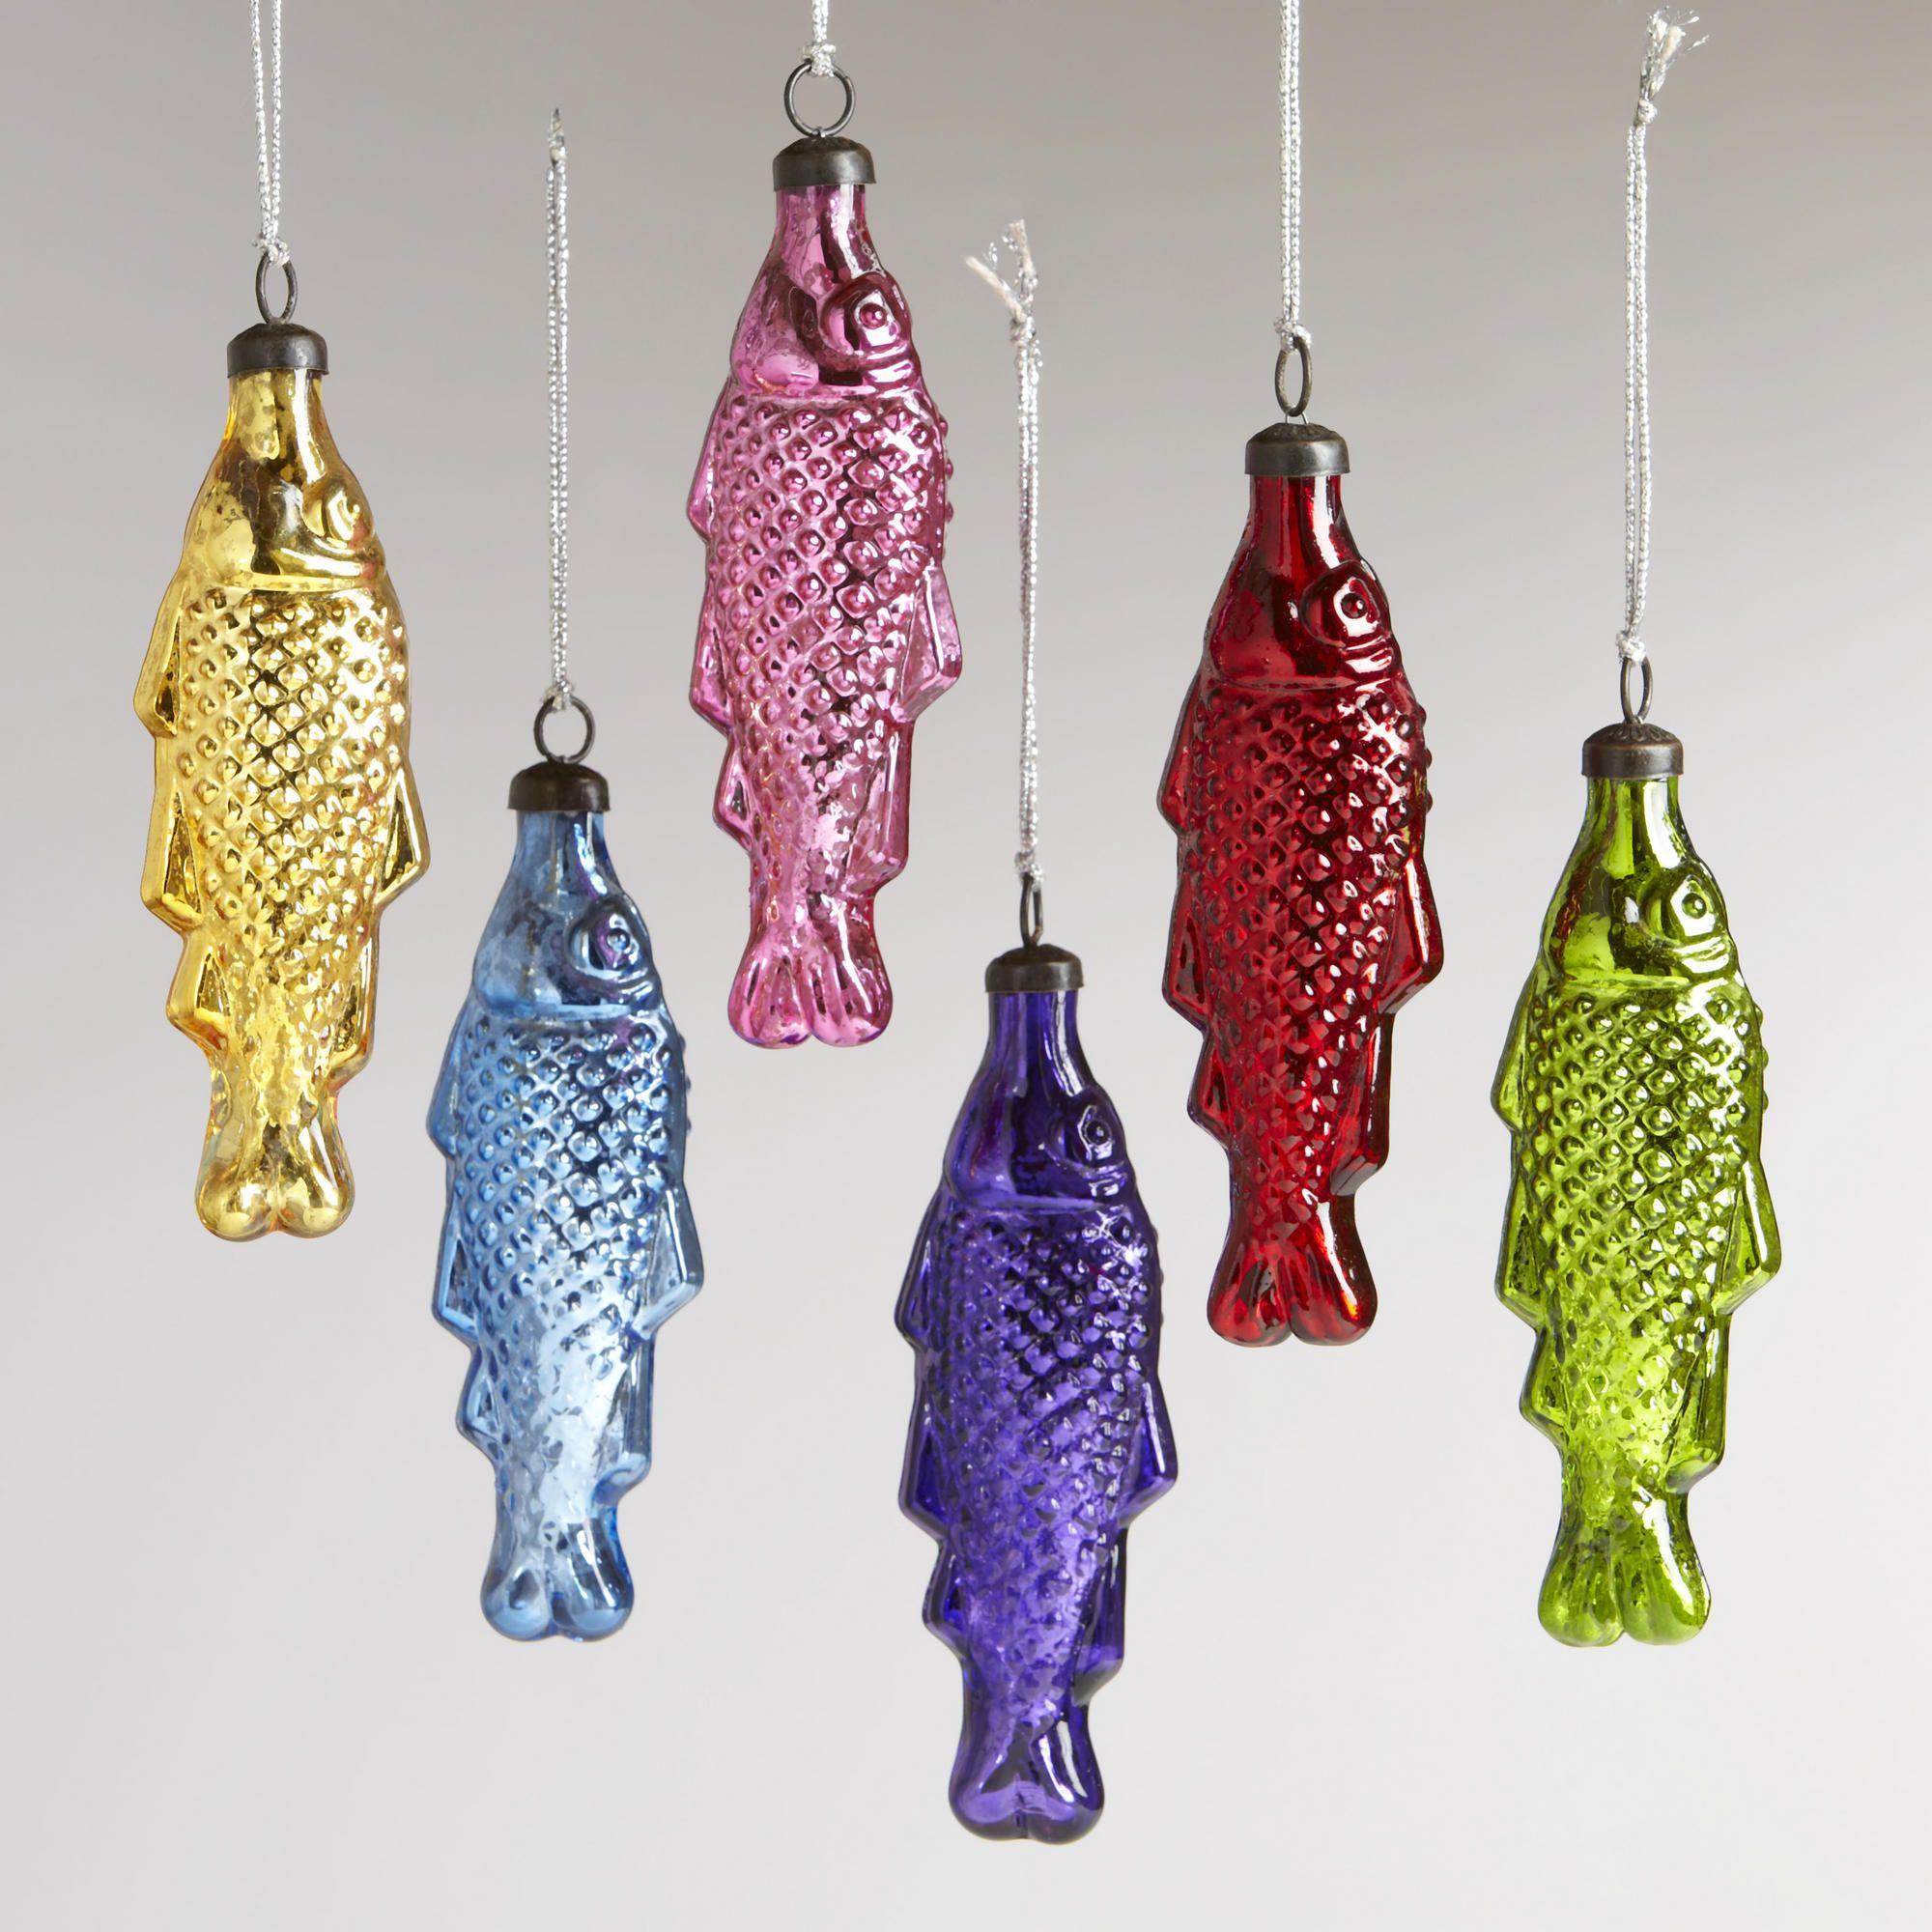 Fish christmas ornaments - Metal Virgil Accent Table Fish Ornamentsswedish Fishchristmas